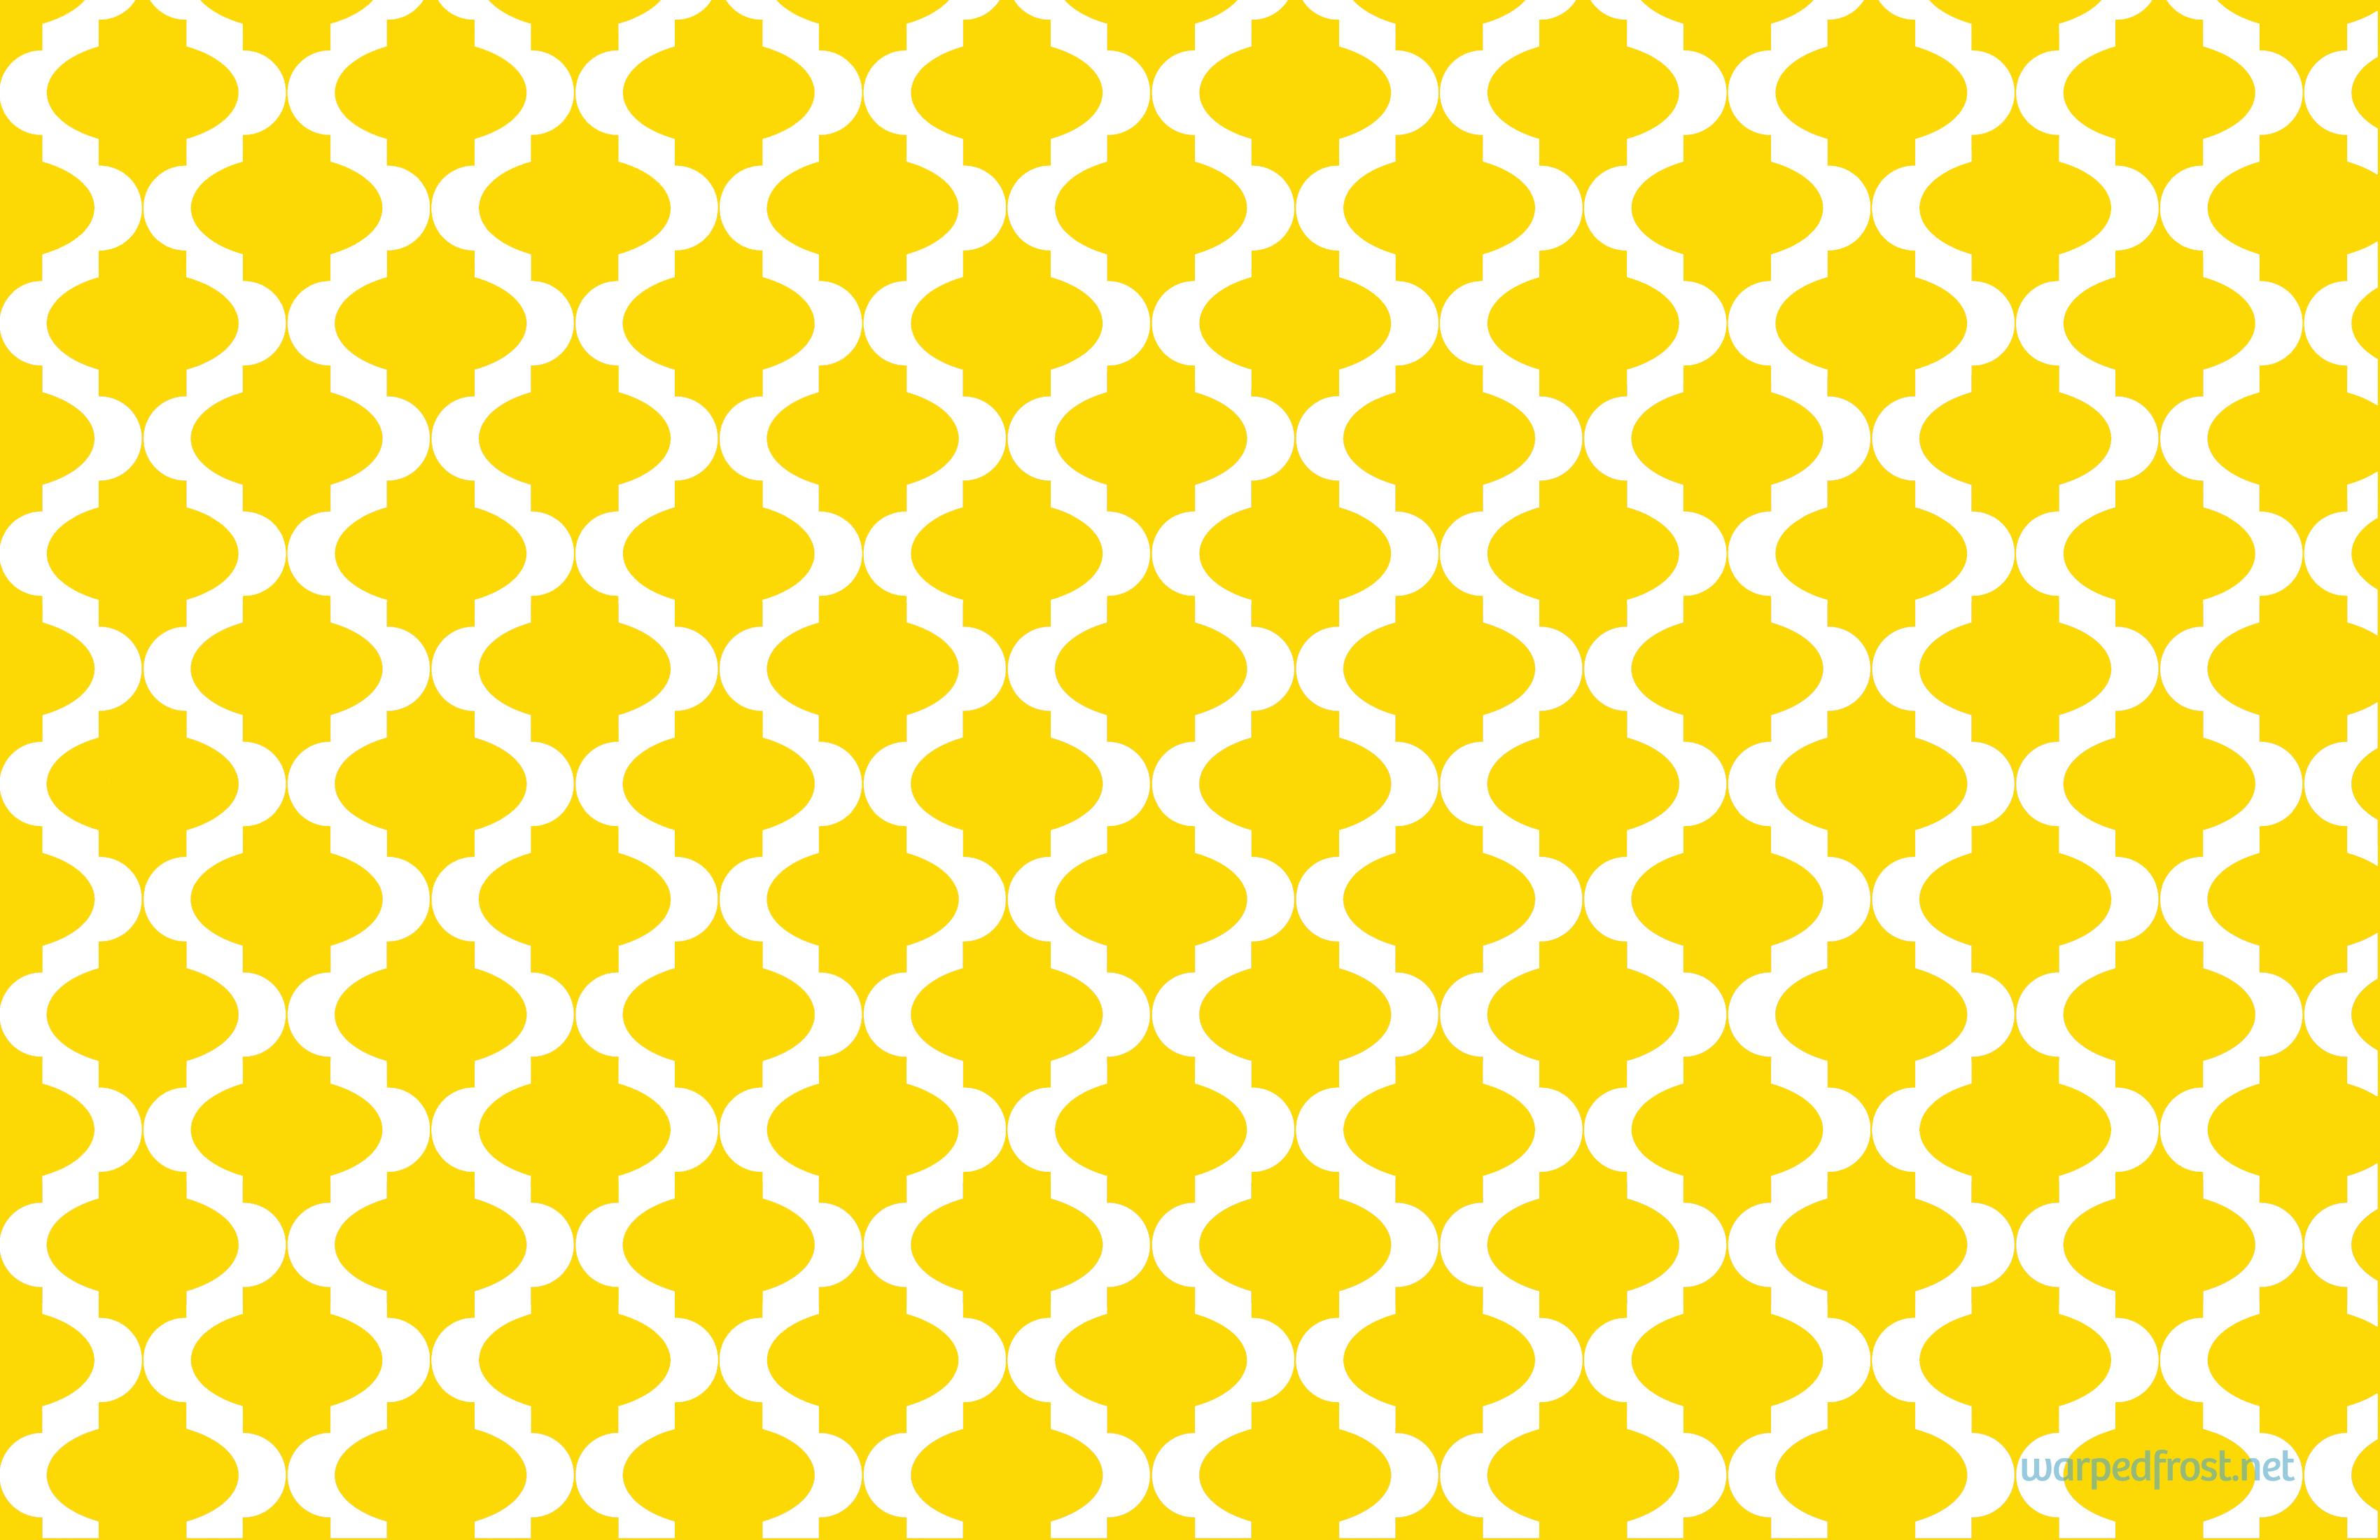 Quatrefoil Pattern Interesting Design Ideas